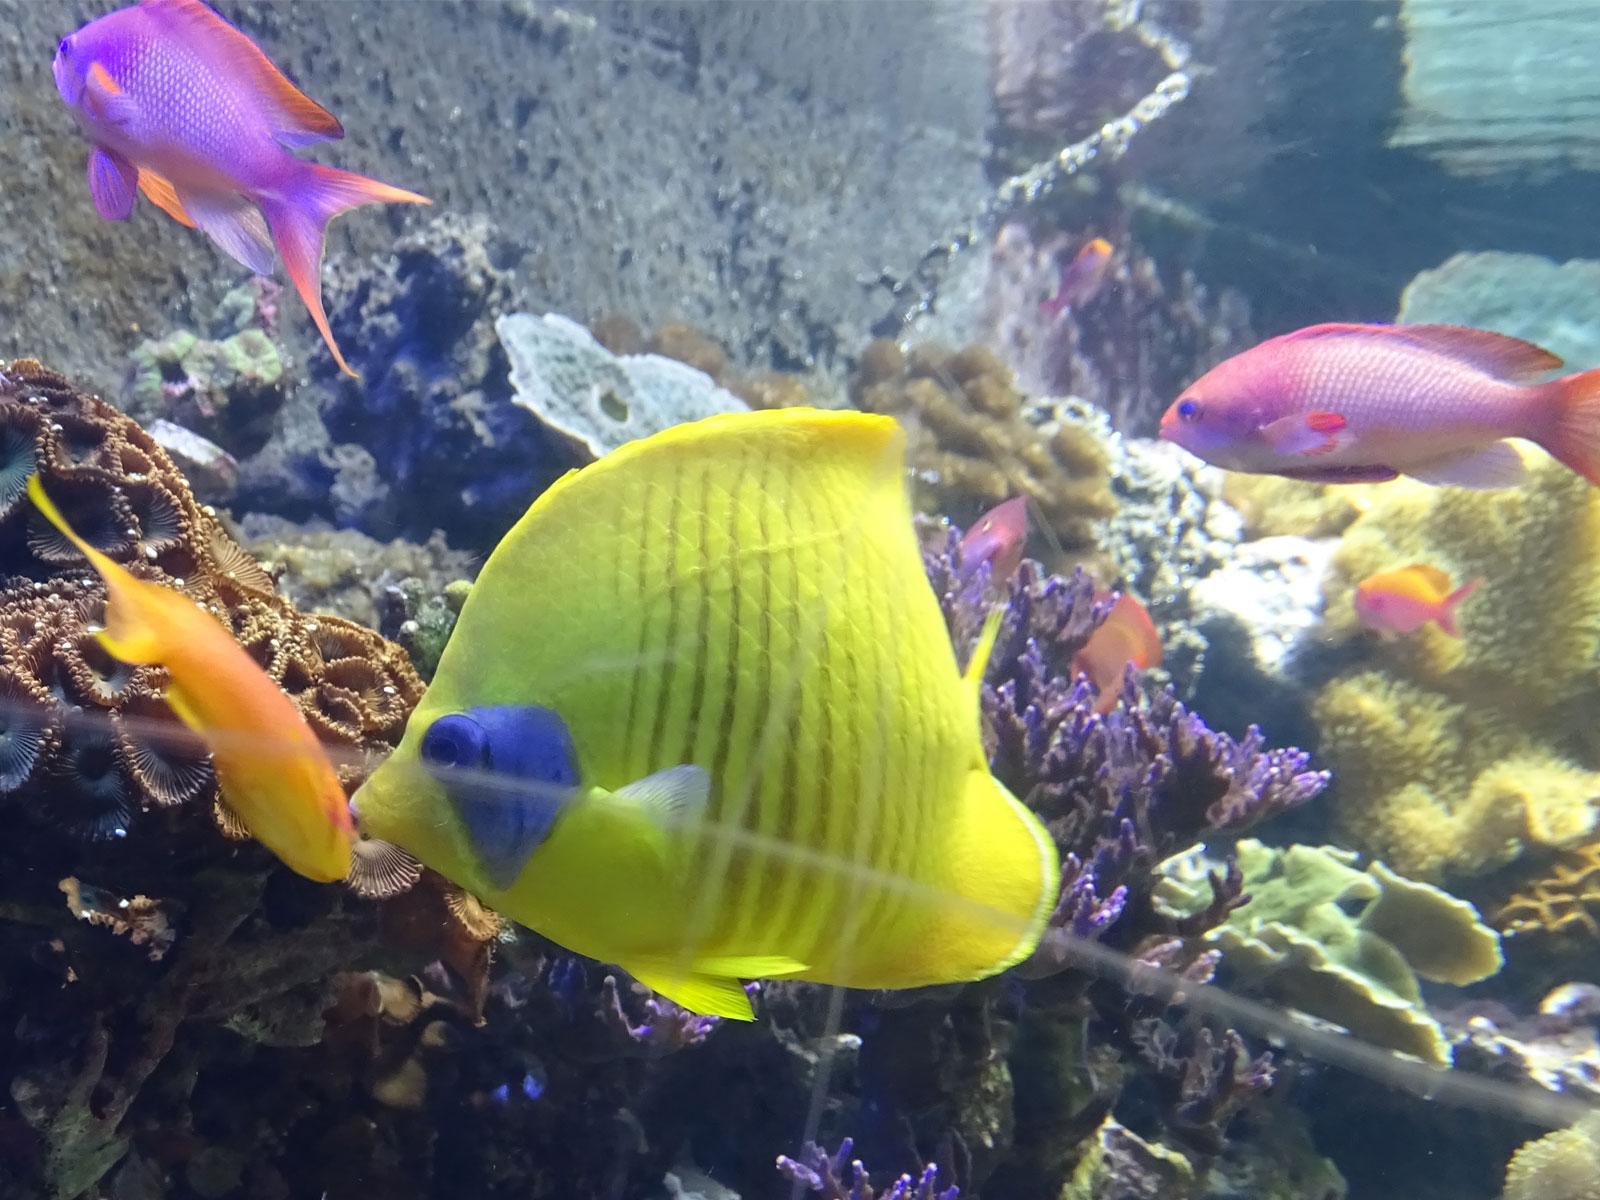 Sea Life London Aquarium Places Visited by Yhon Soto Solutions